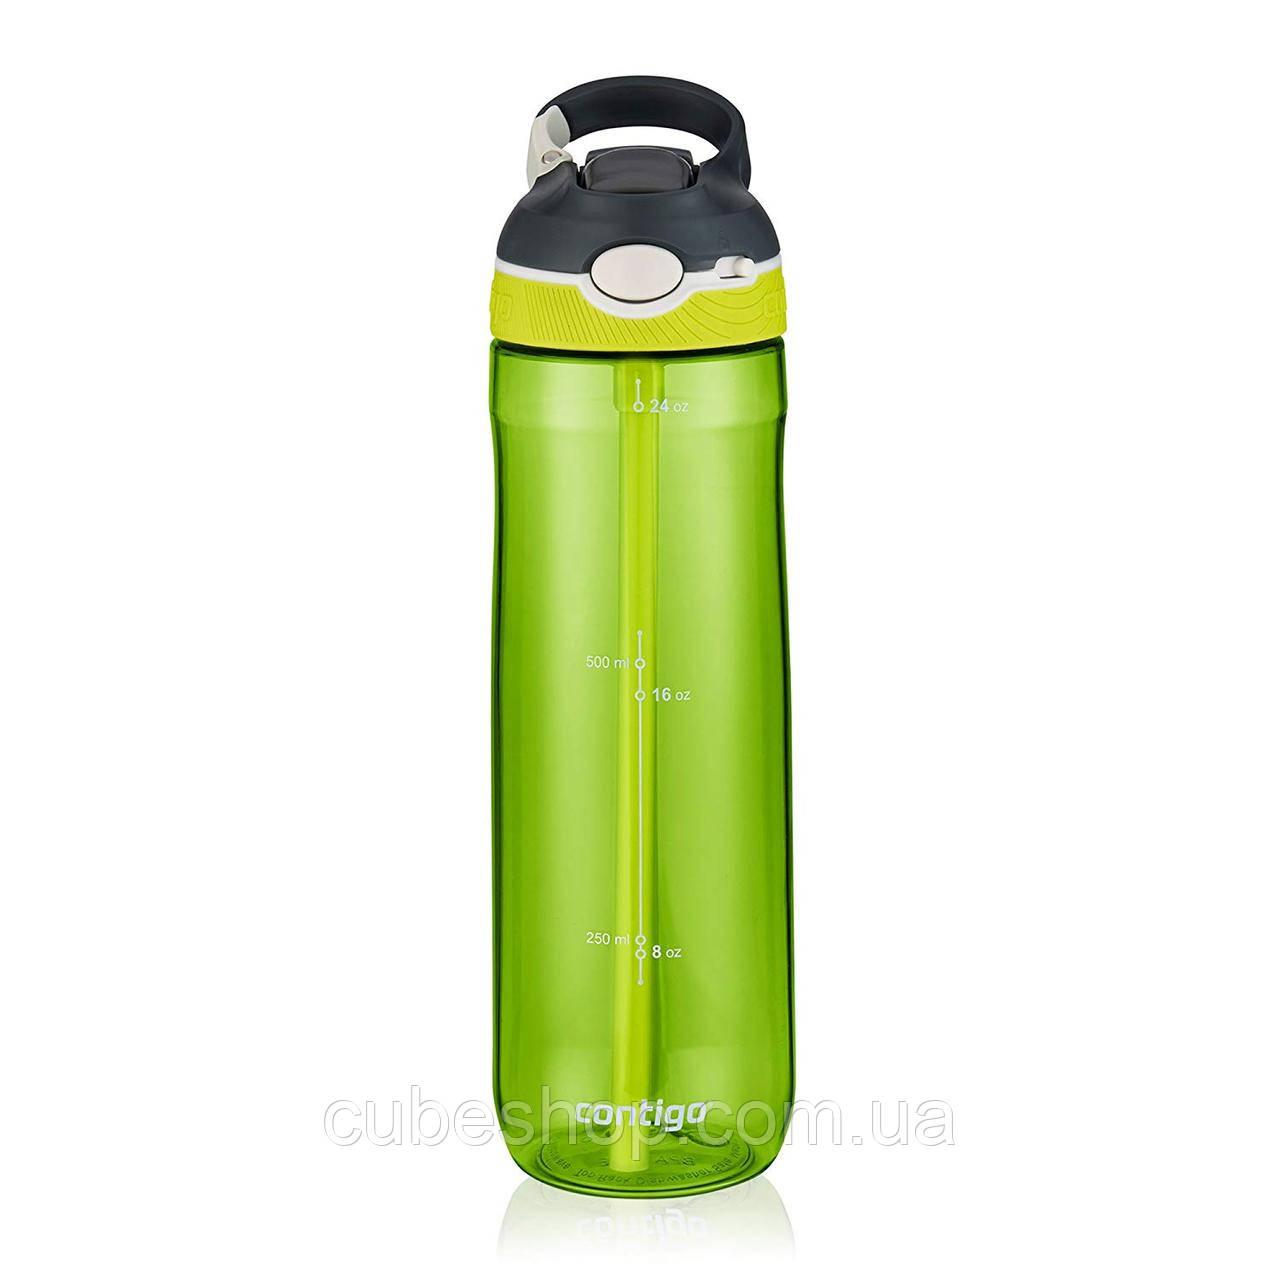 Спортивная бутылка для воды Contigo Ashland Vibrant Lime (720 мл)